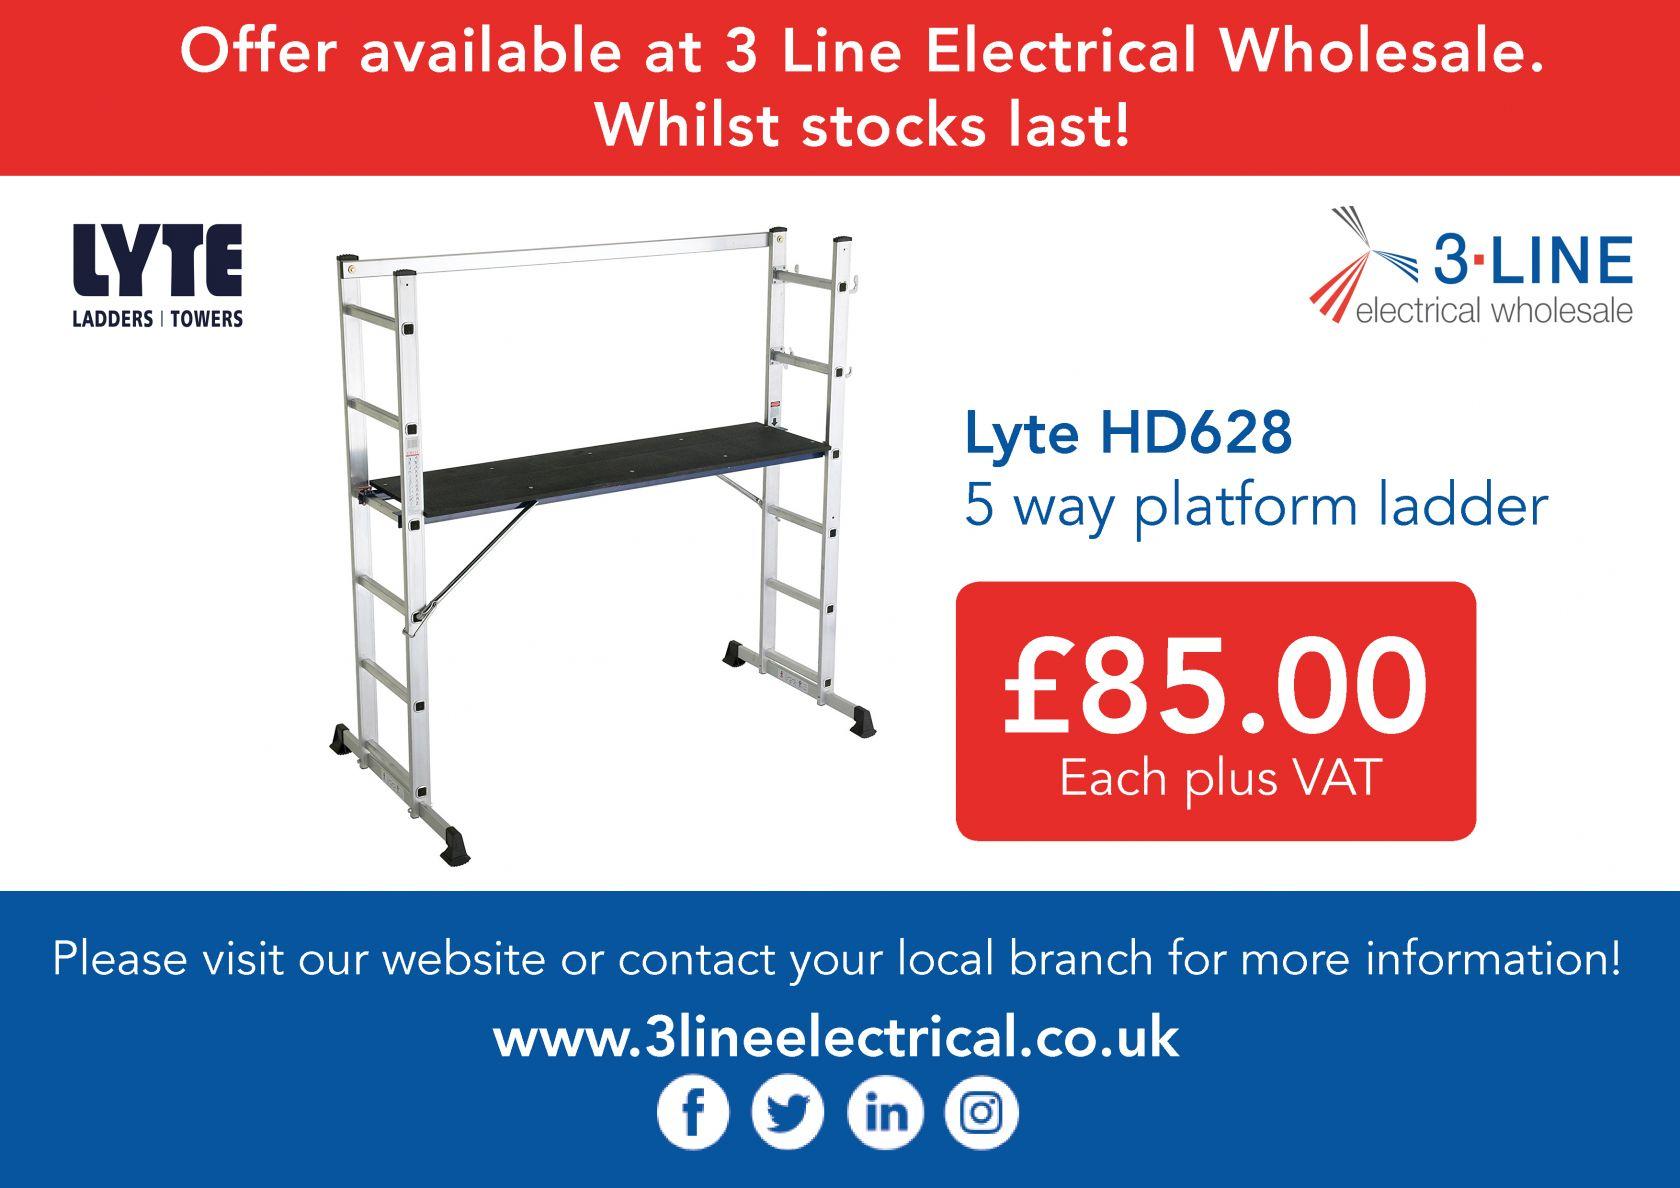 Lyte HD628 5 way platform ladder